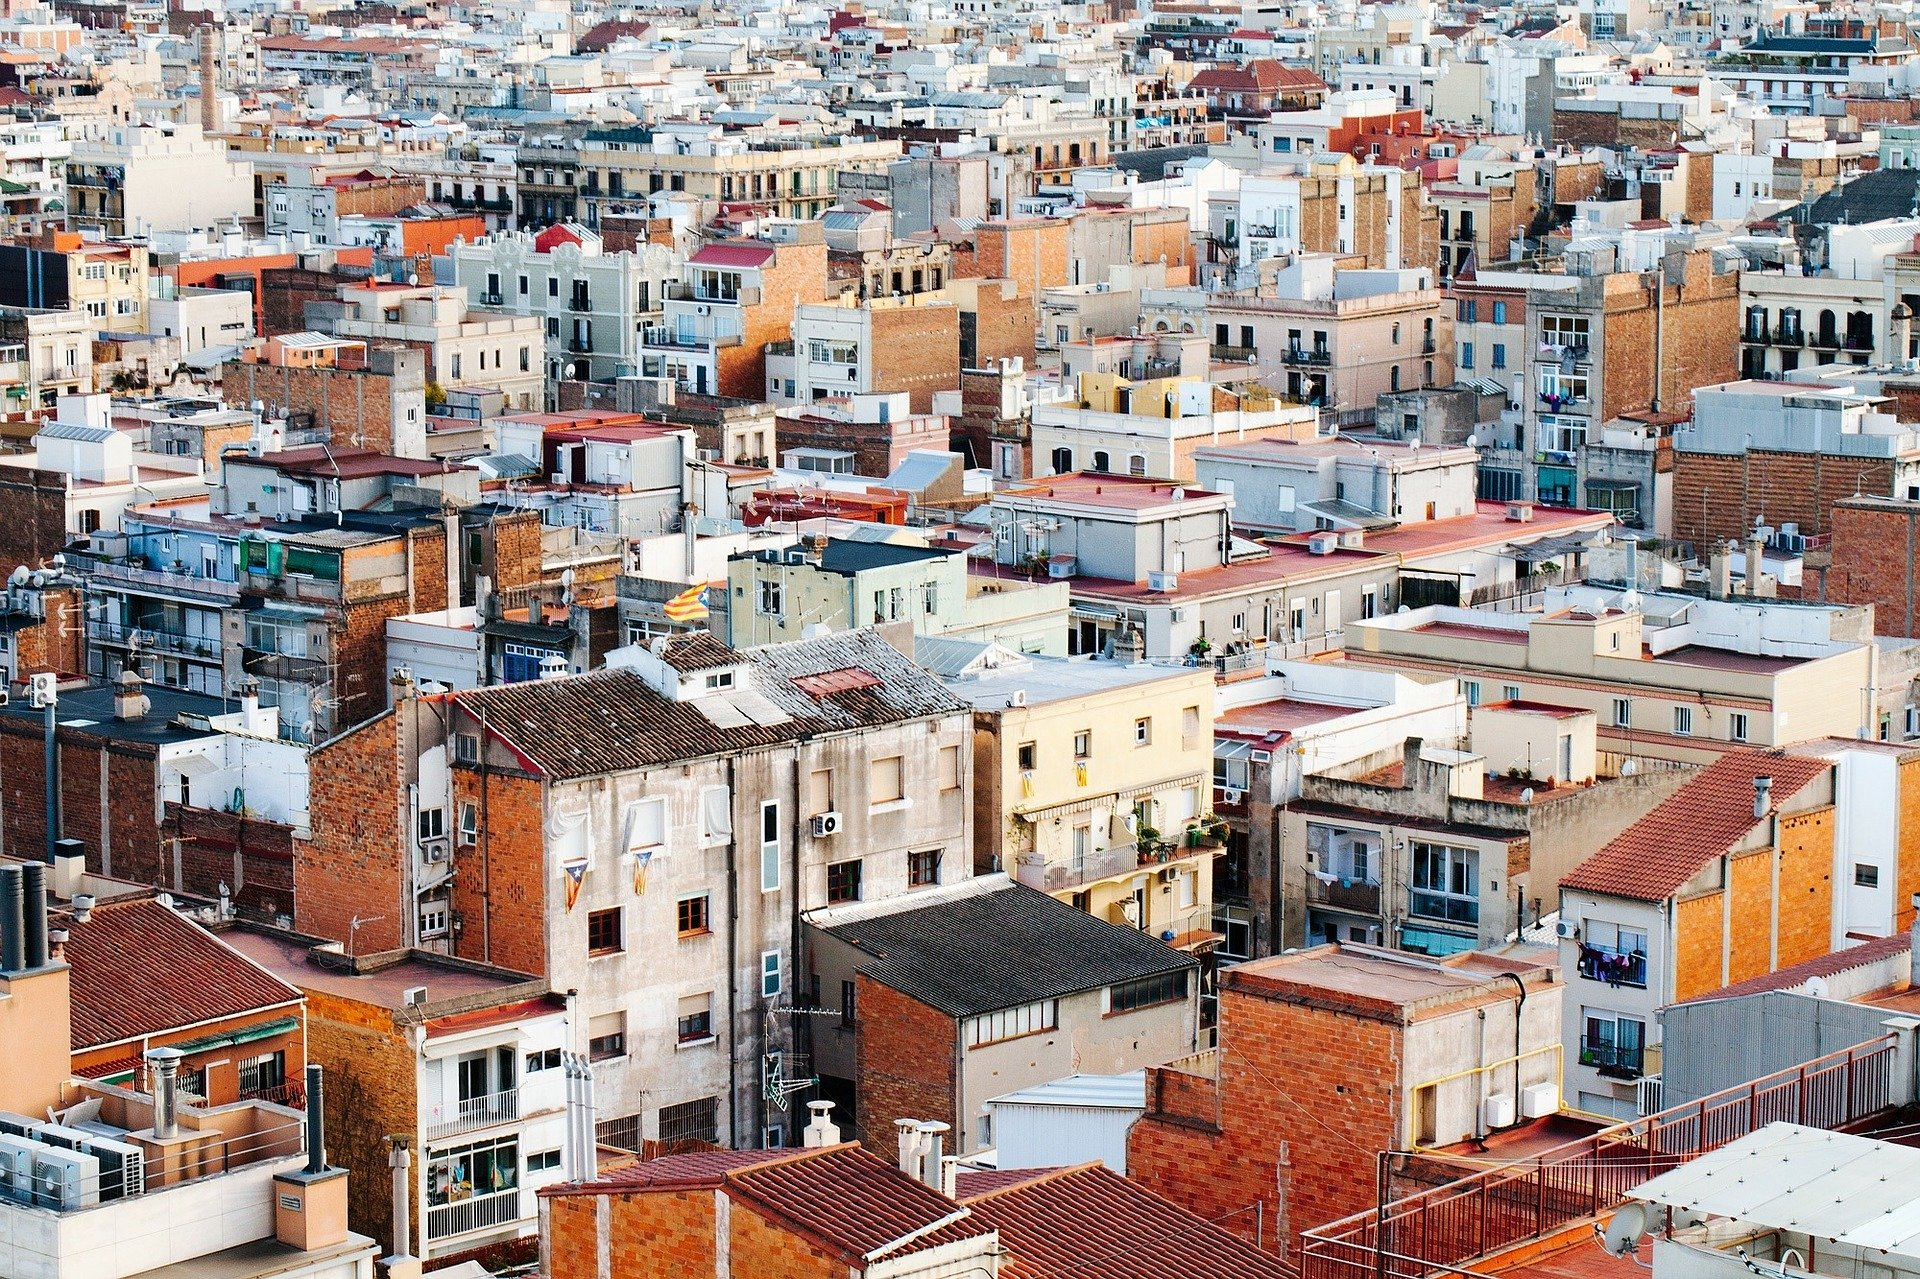 urban-city-1245777_1920.jpg